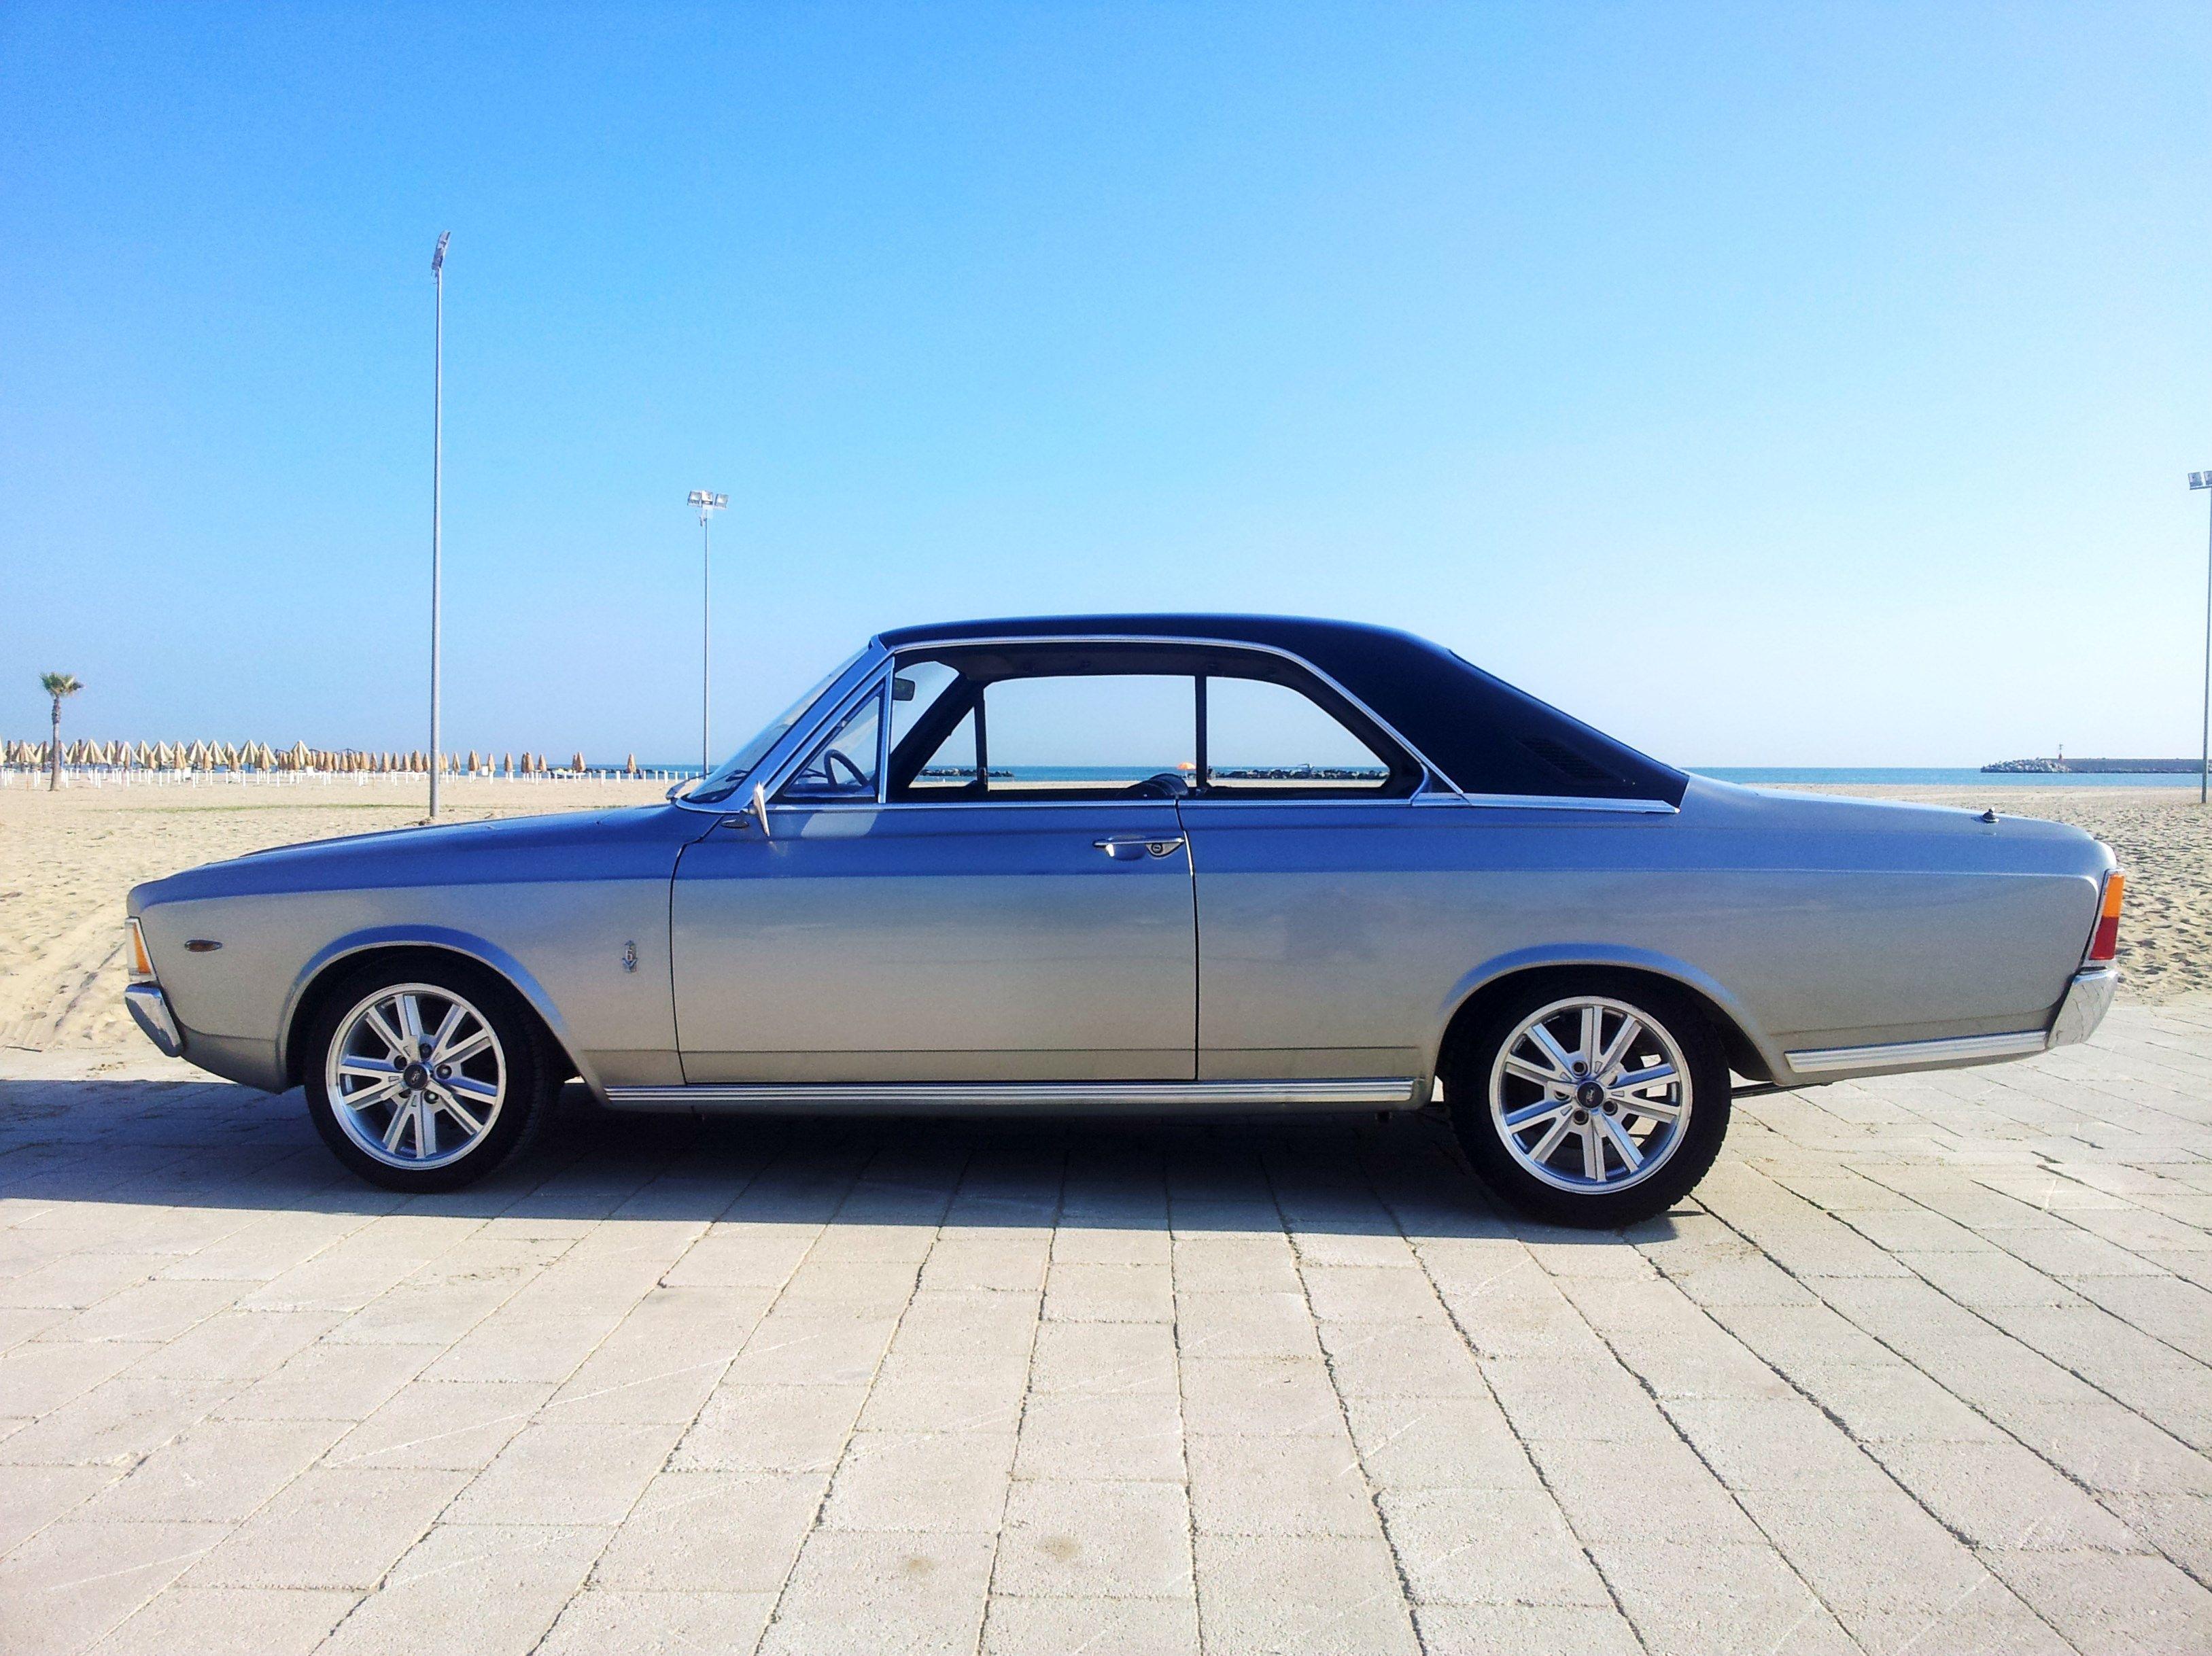 ford taunus coupe 2300s xl v6 anno 1968 x info tel 3345717642 vs agarage pinterest ford. Black Bedroom Furniture Sets. Home Design Ideas